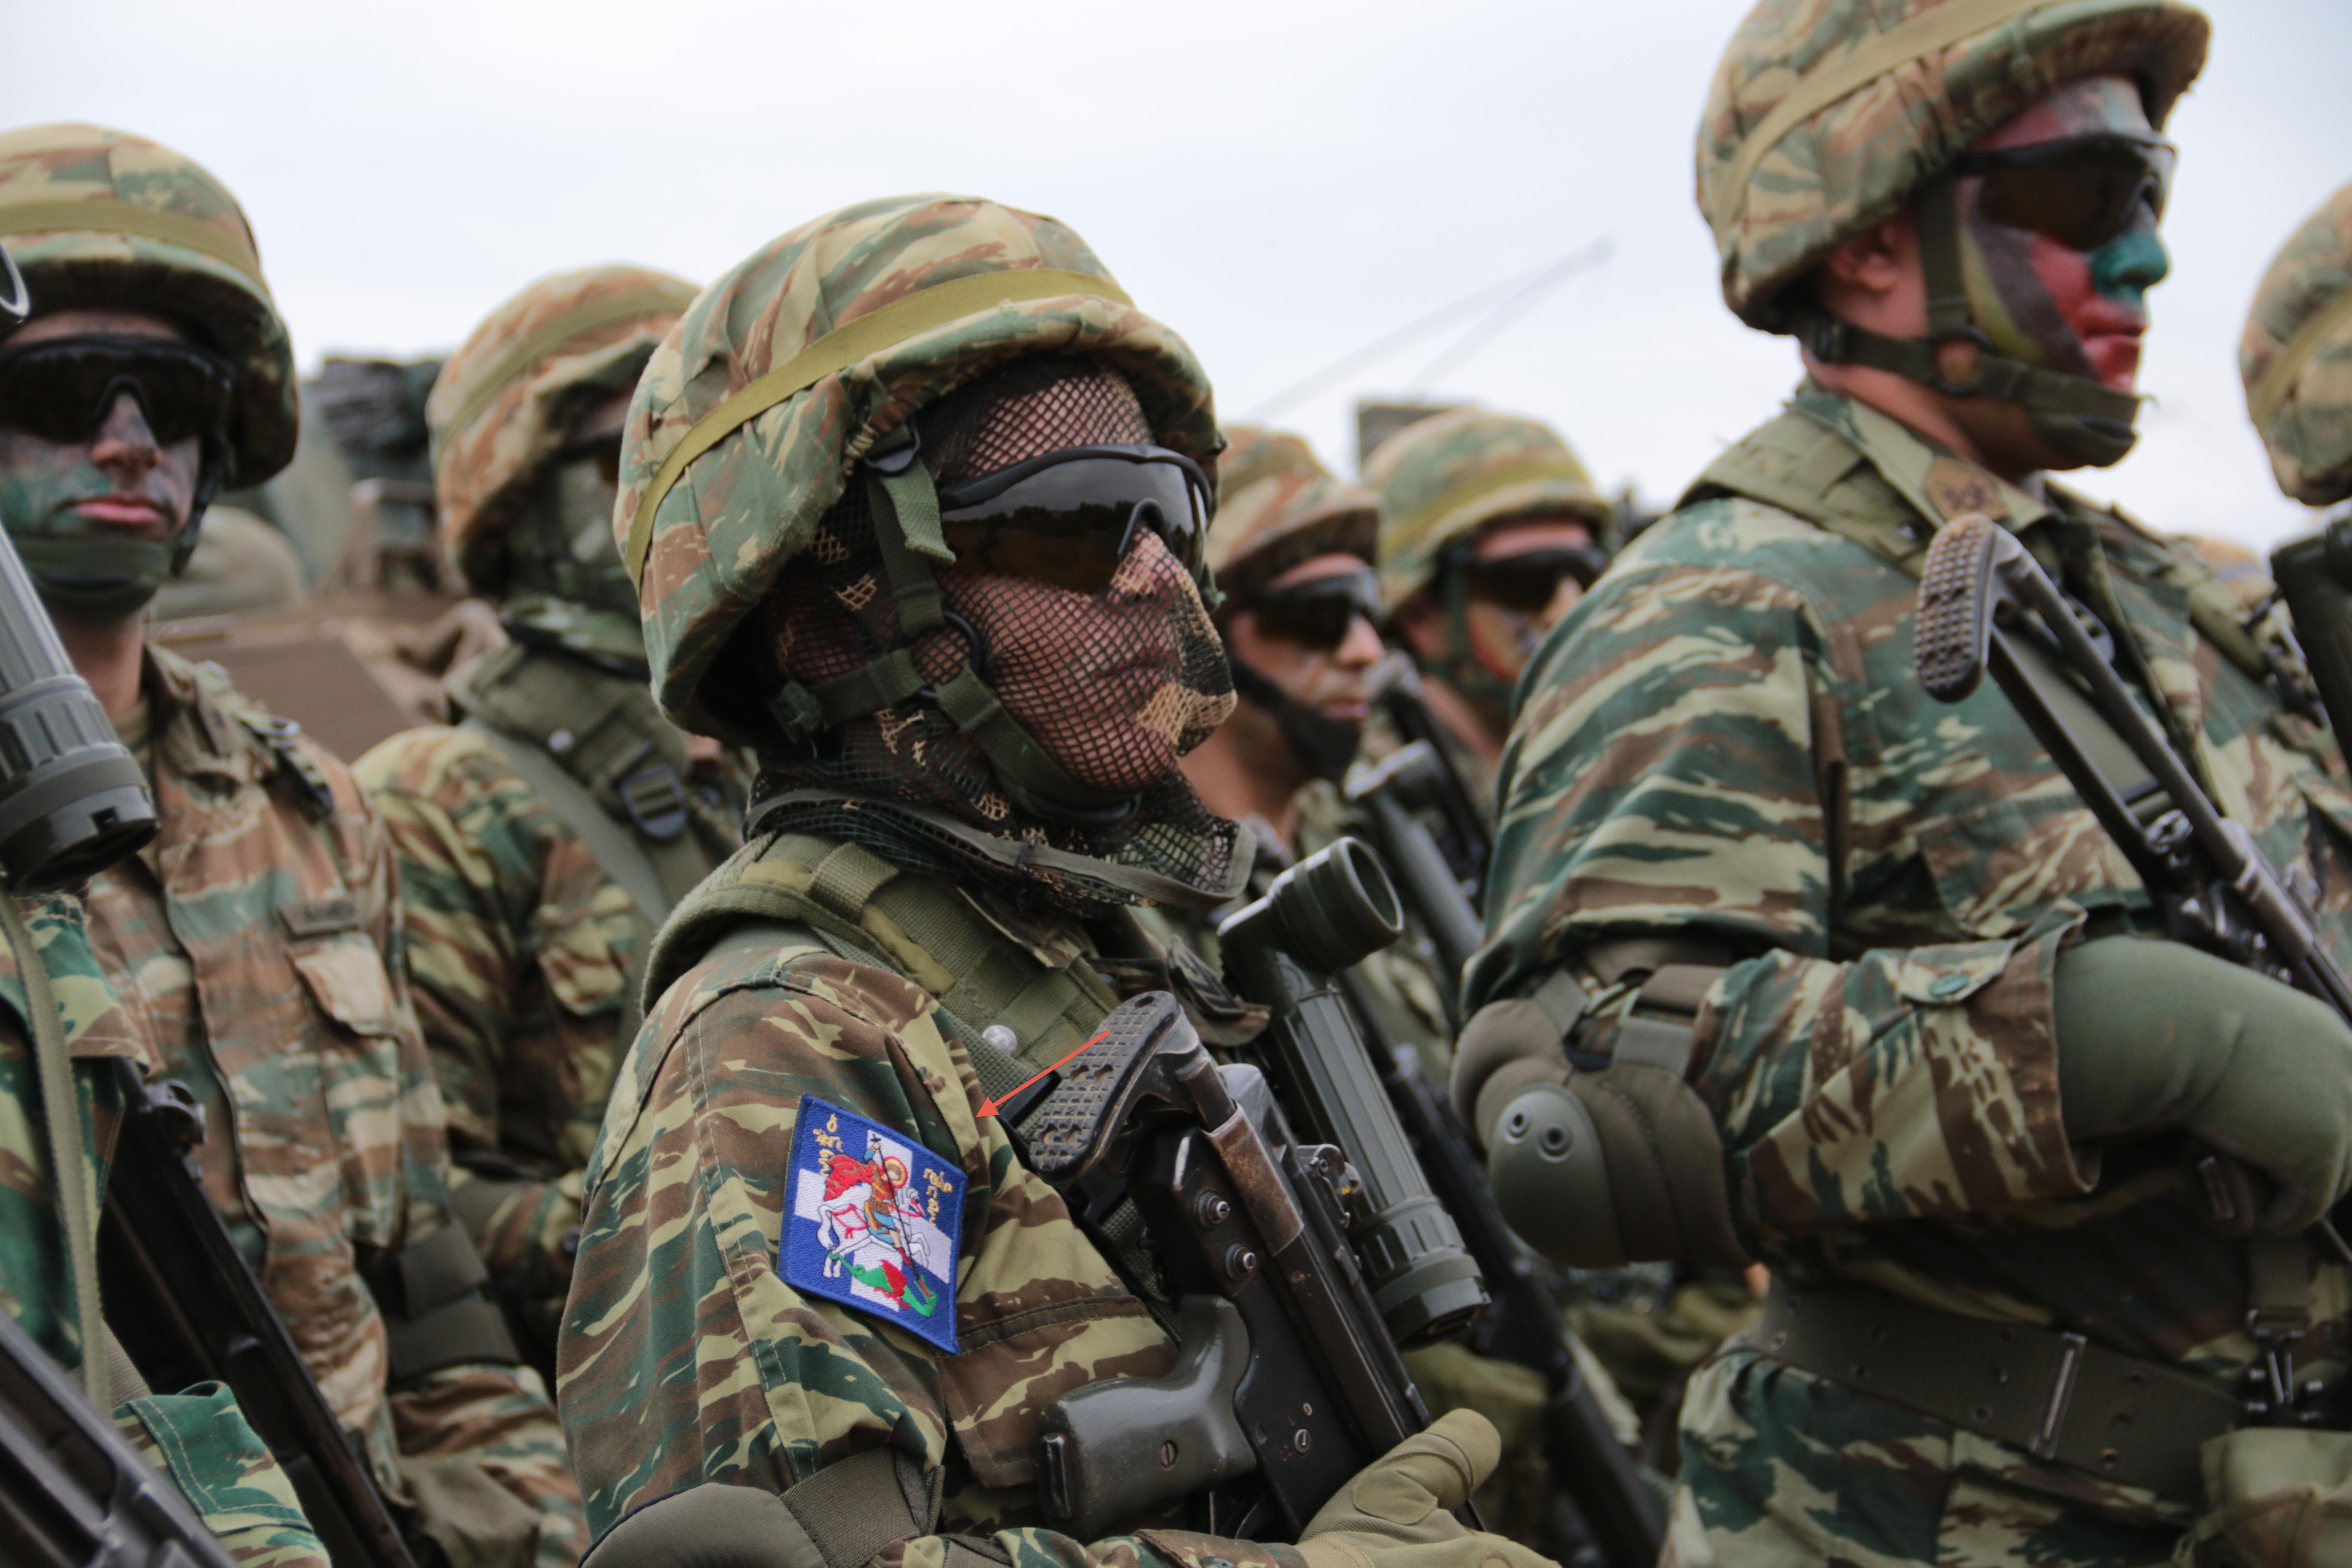 http://veteranos.gr/wp-content/uploads/2015/10/veteranos.gr_1.jpeg